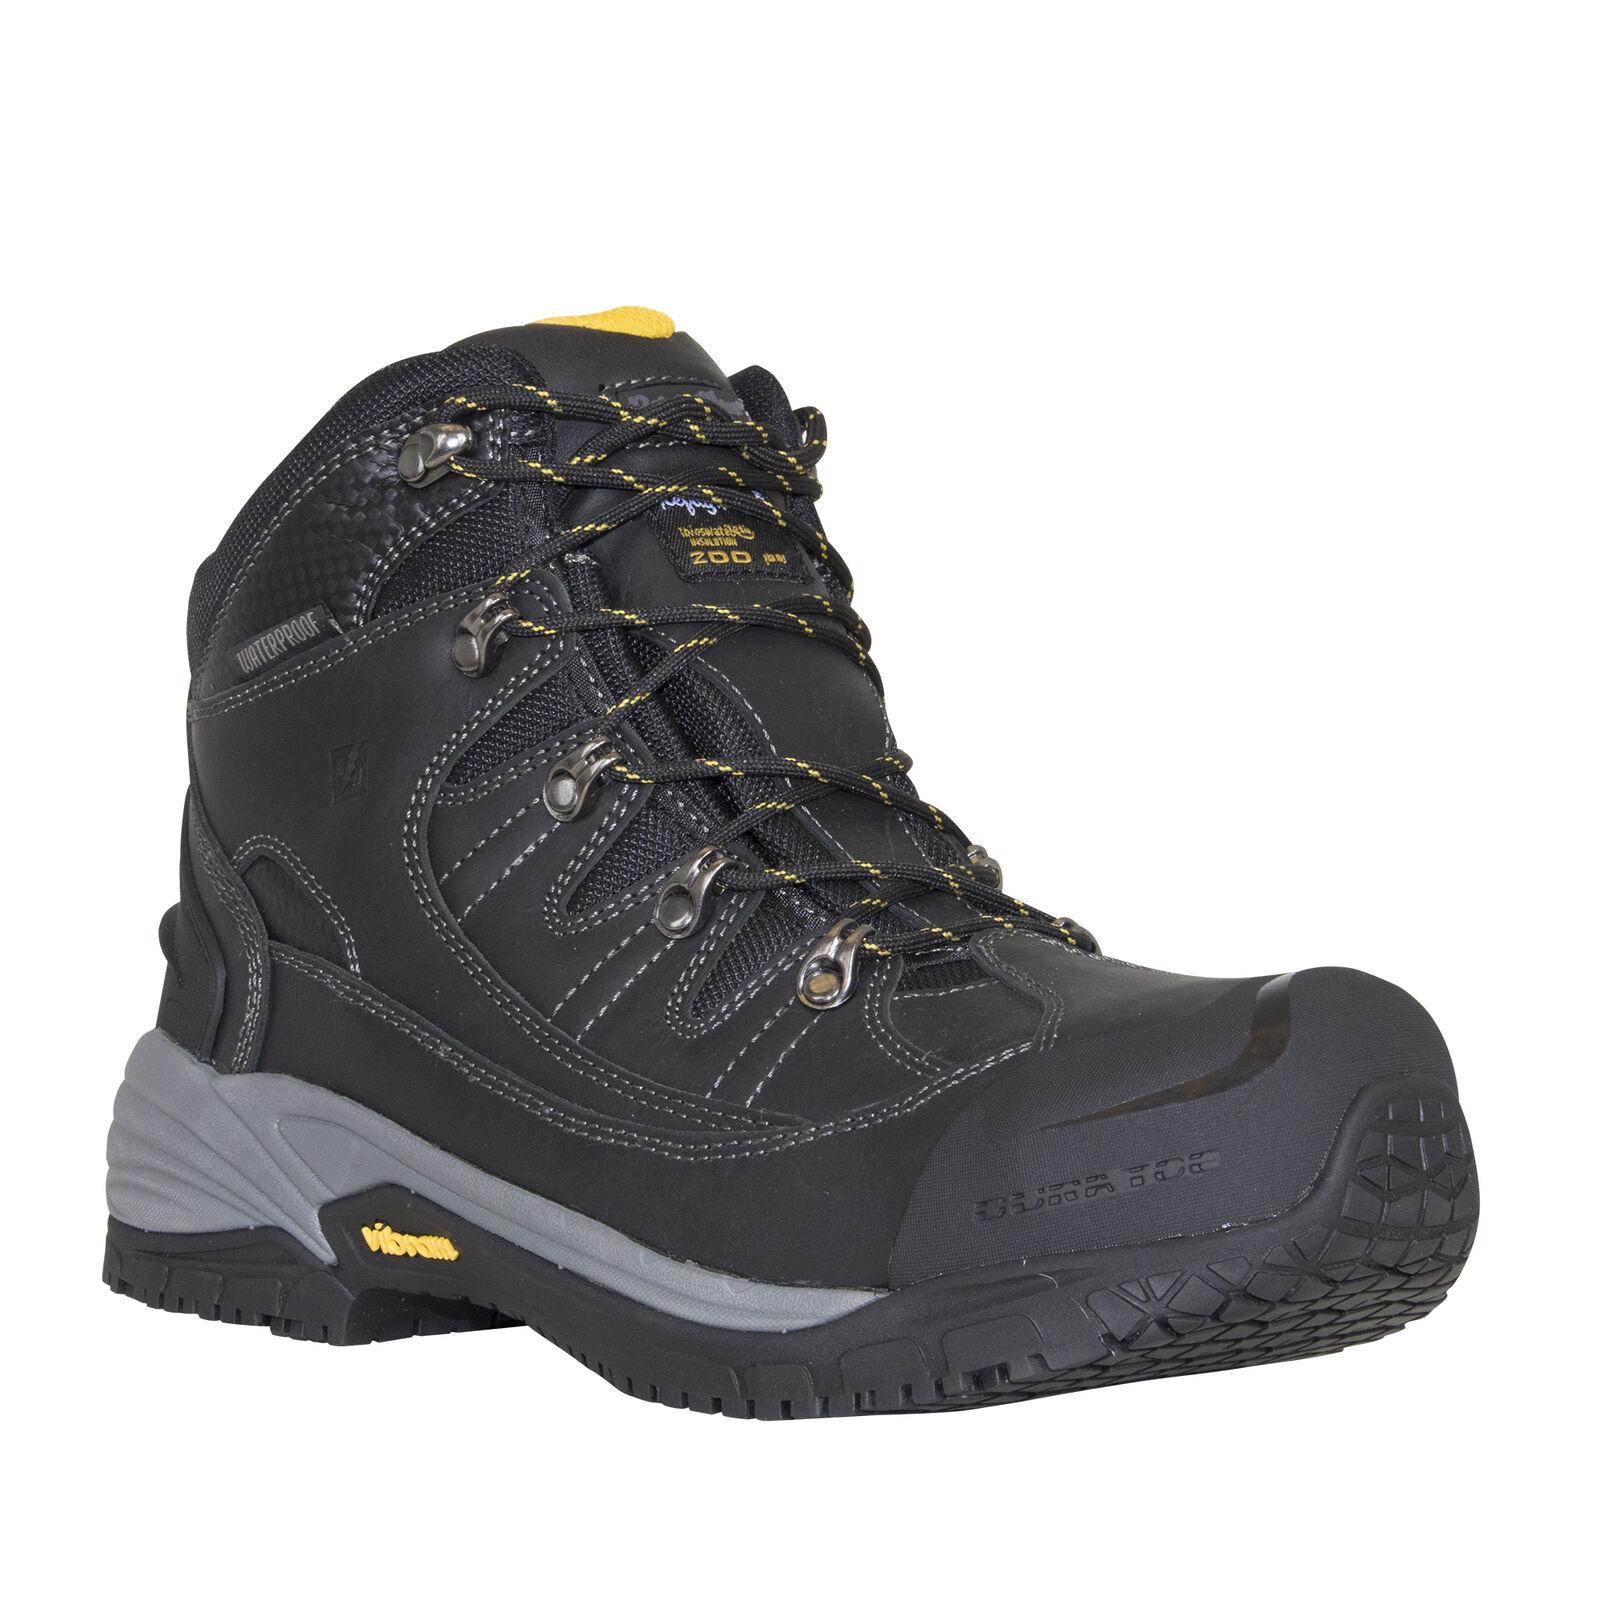 RefrigiWear Men's Iron Hiker Waterproof Lightweight Work Boots, Black